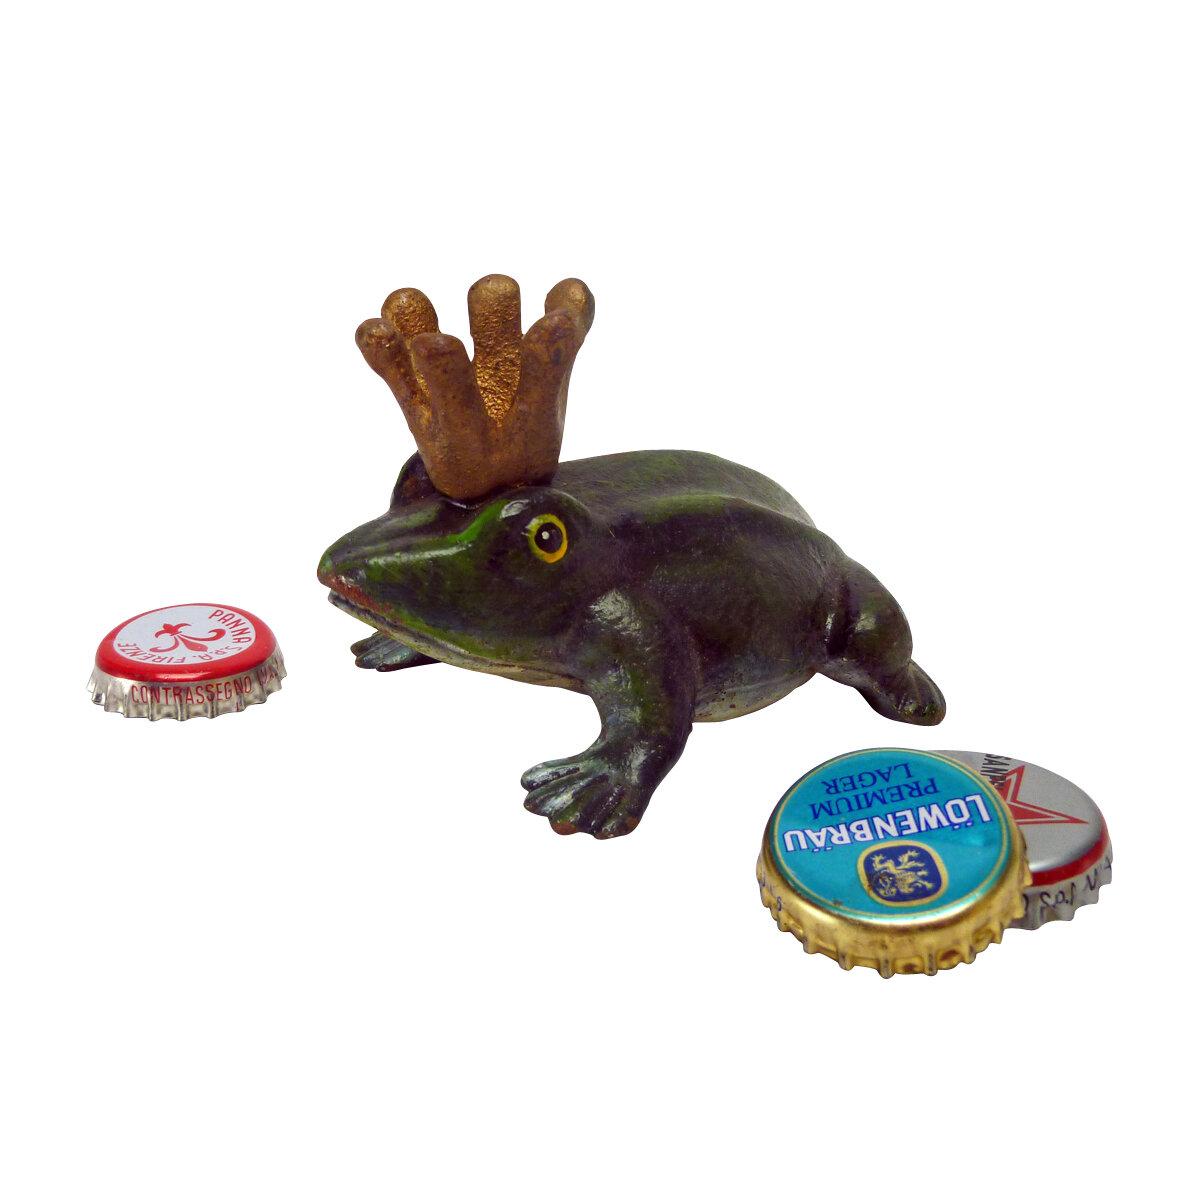 Design Toscano Frog King Bottle Opener Reviews Wayfair